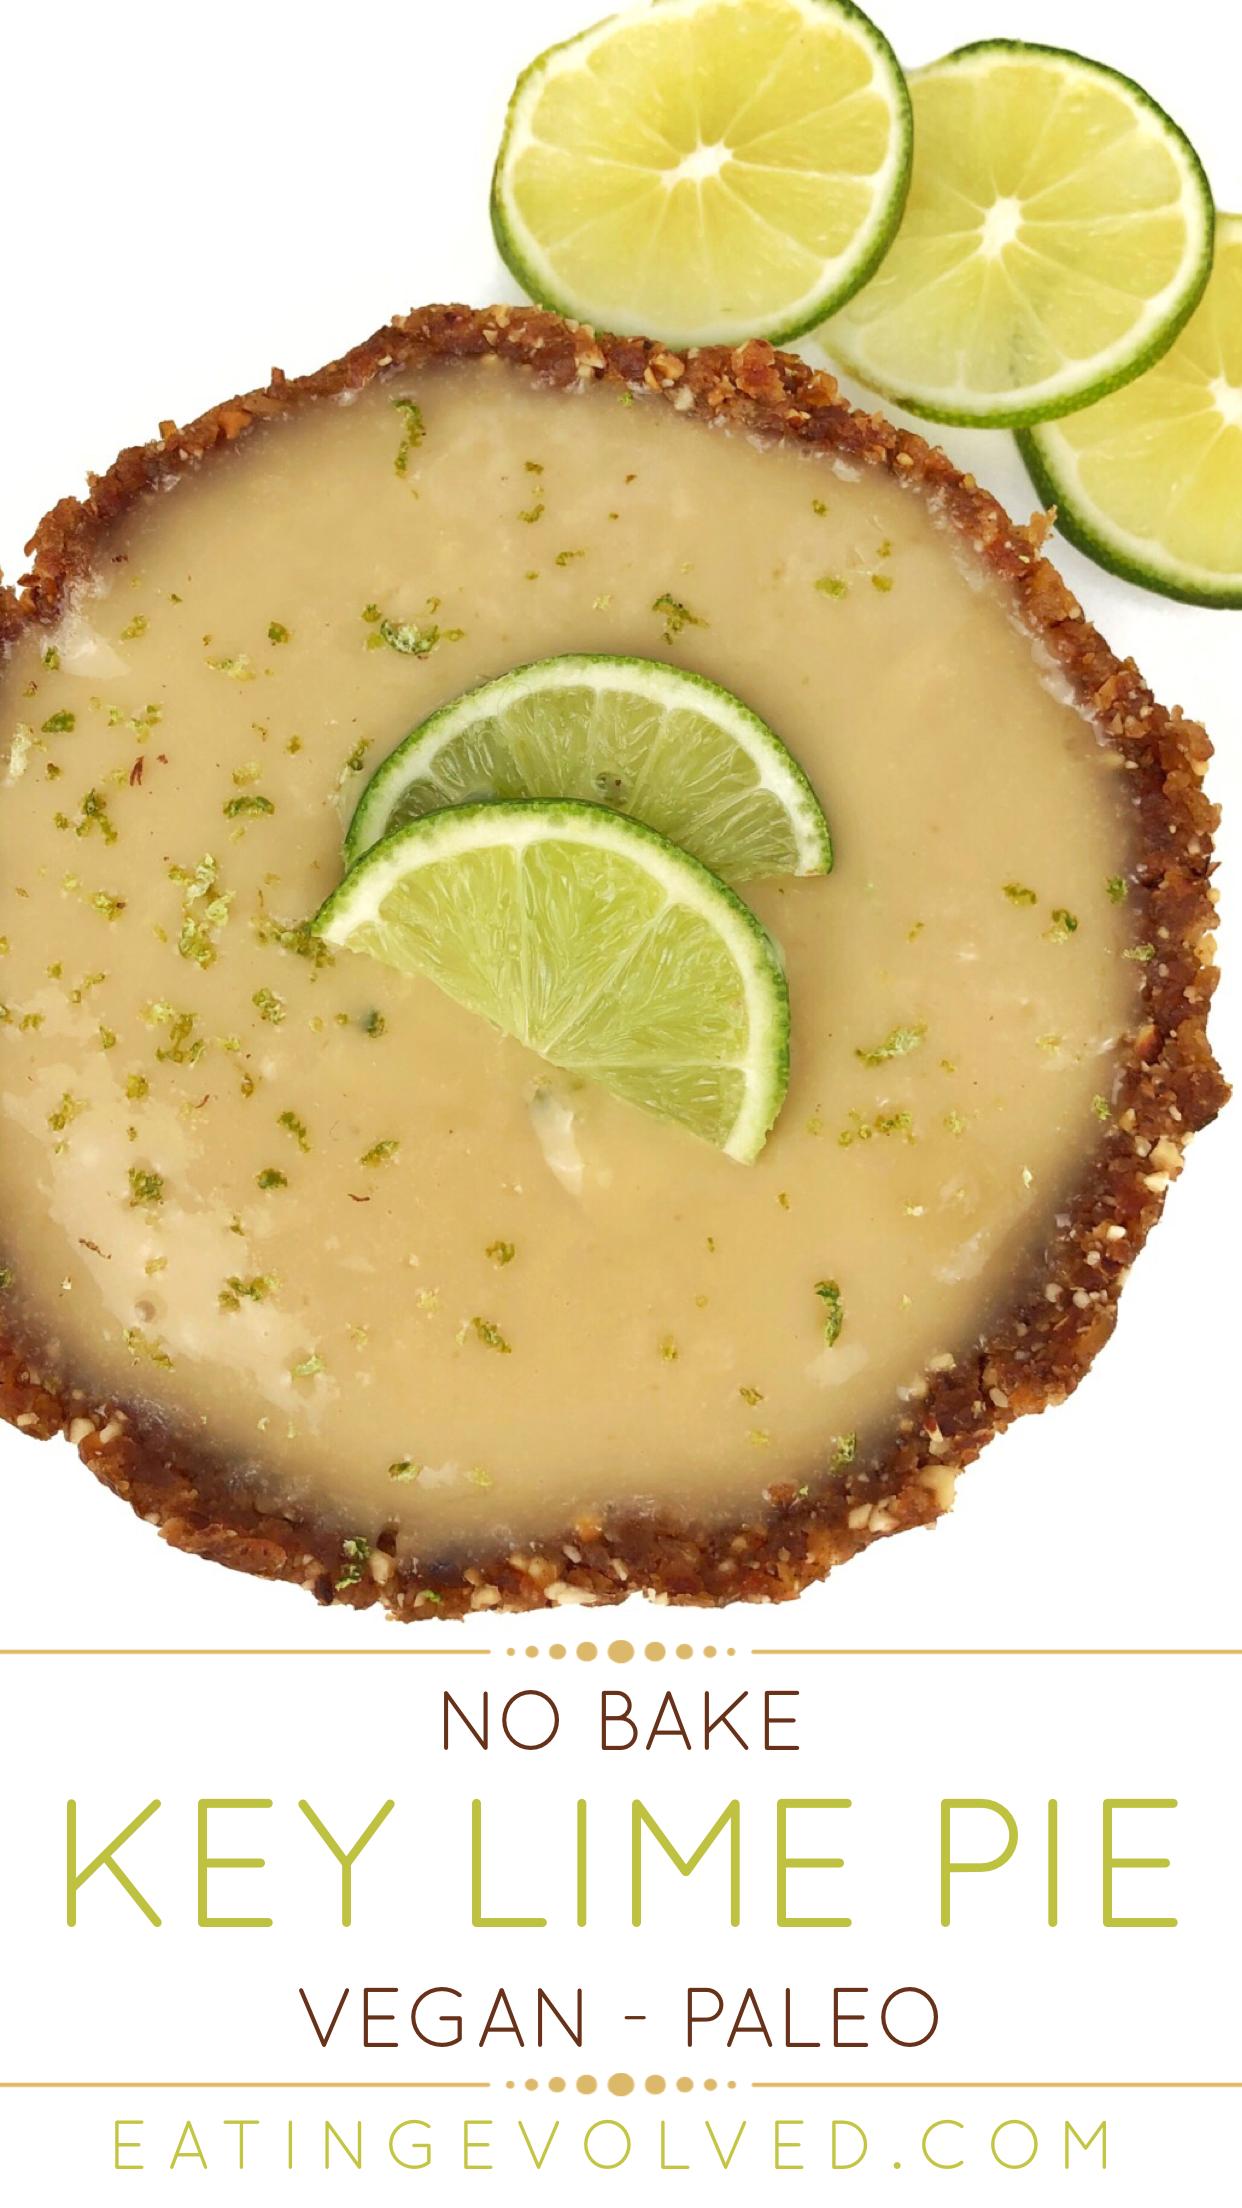 Vegan Paleo No Bake Key Lime Pie Recipe Vegan Key Lime Pie Paleo Key Lime Pie Key Lime Pie